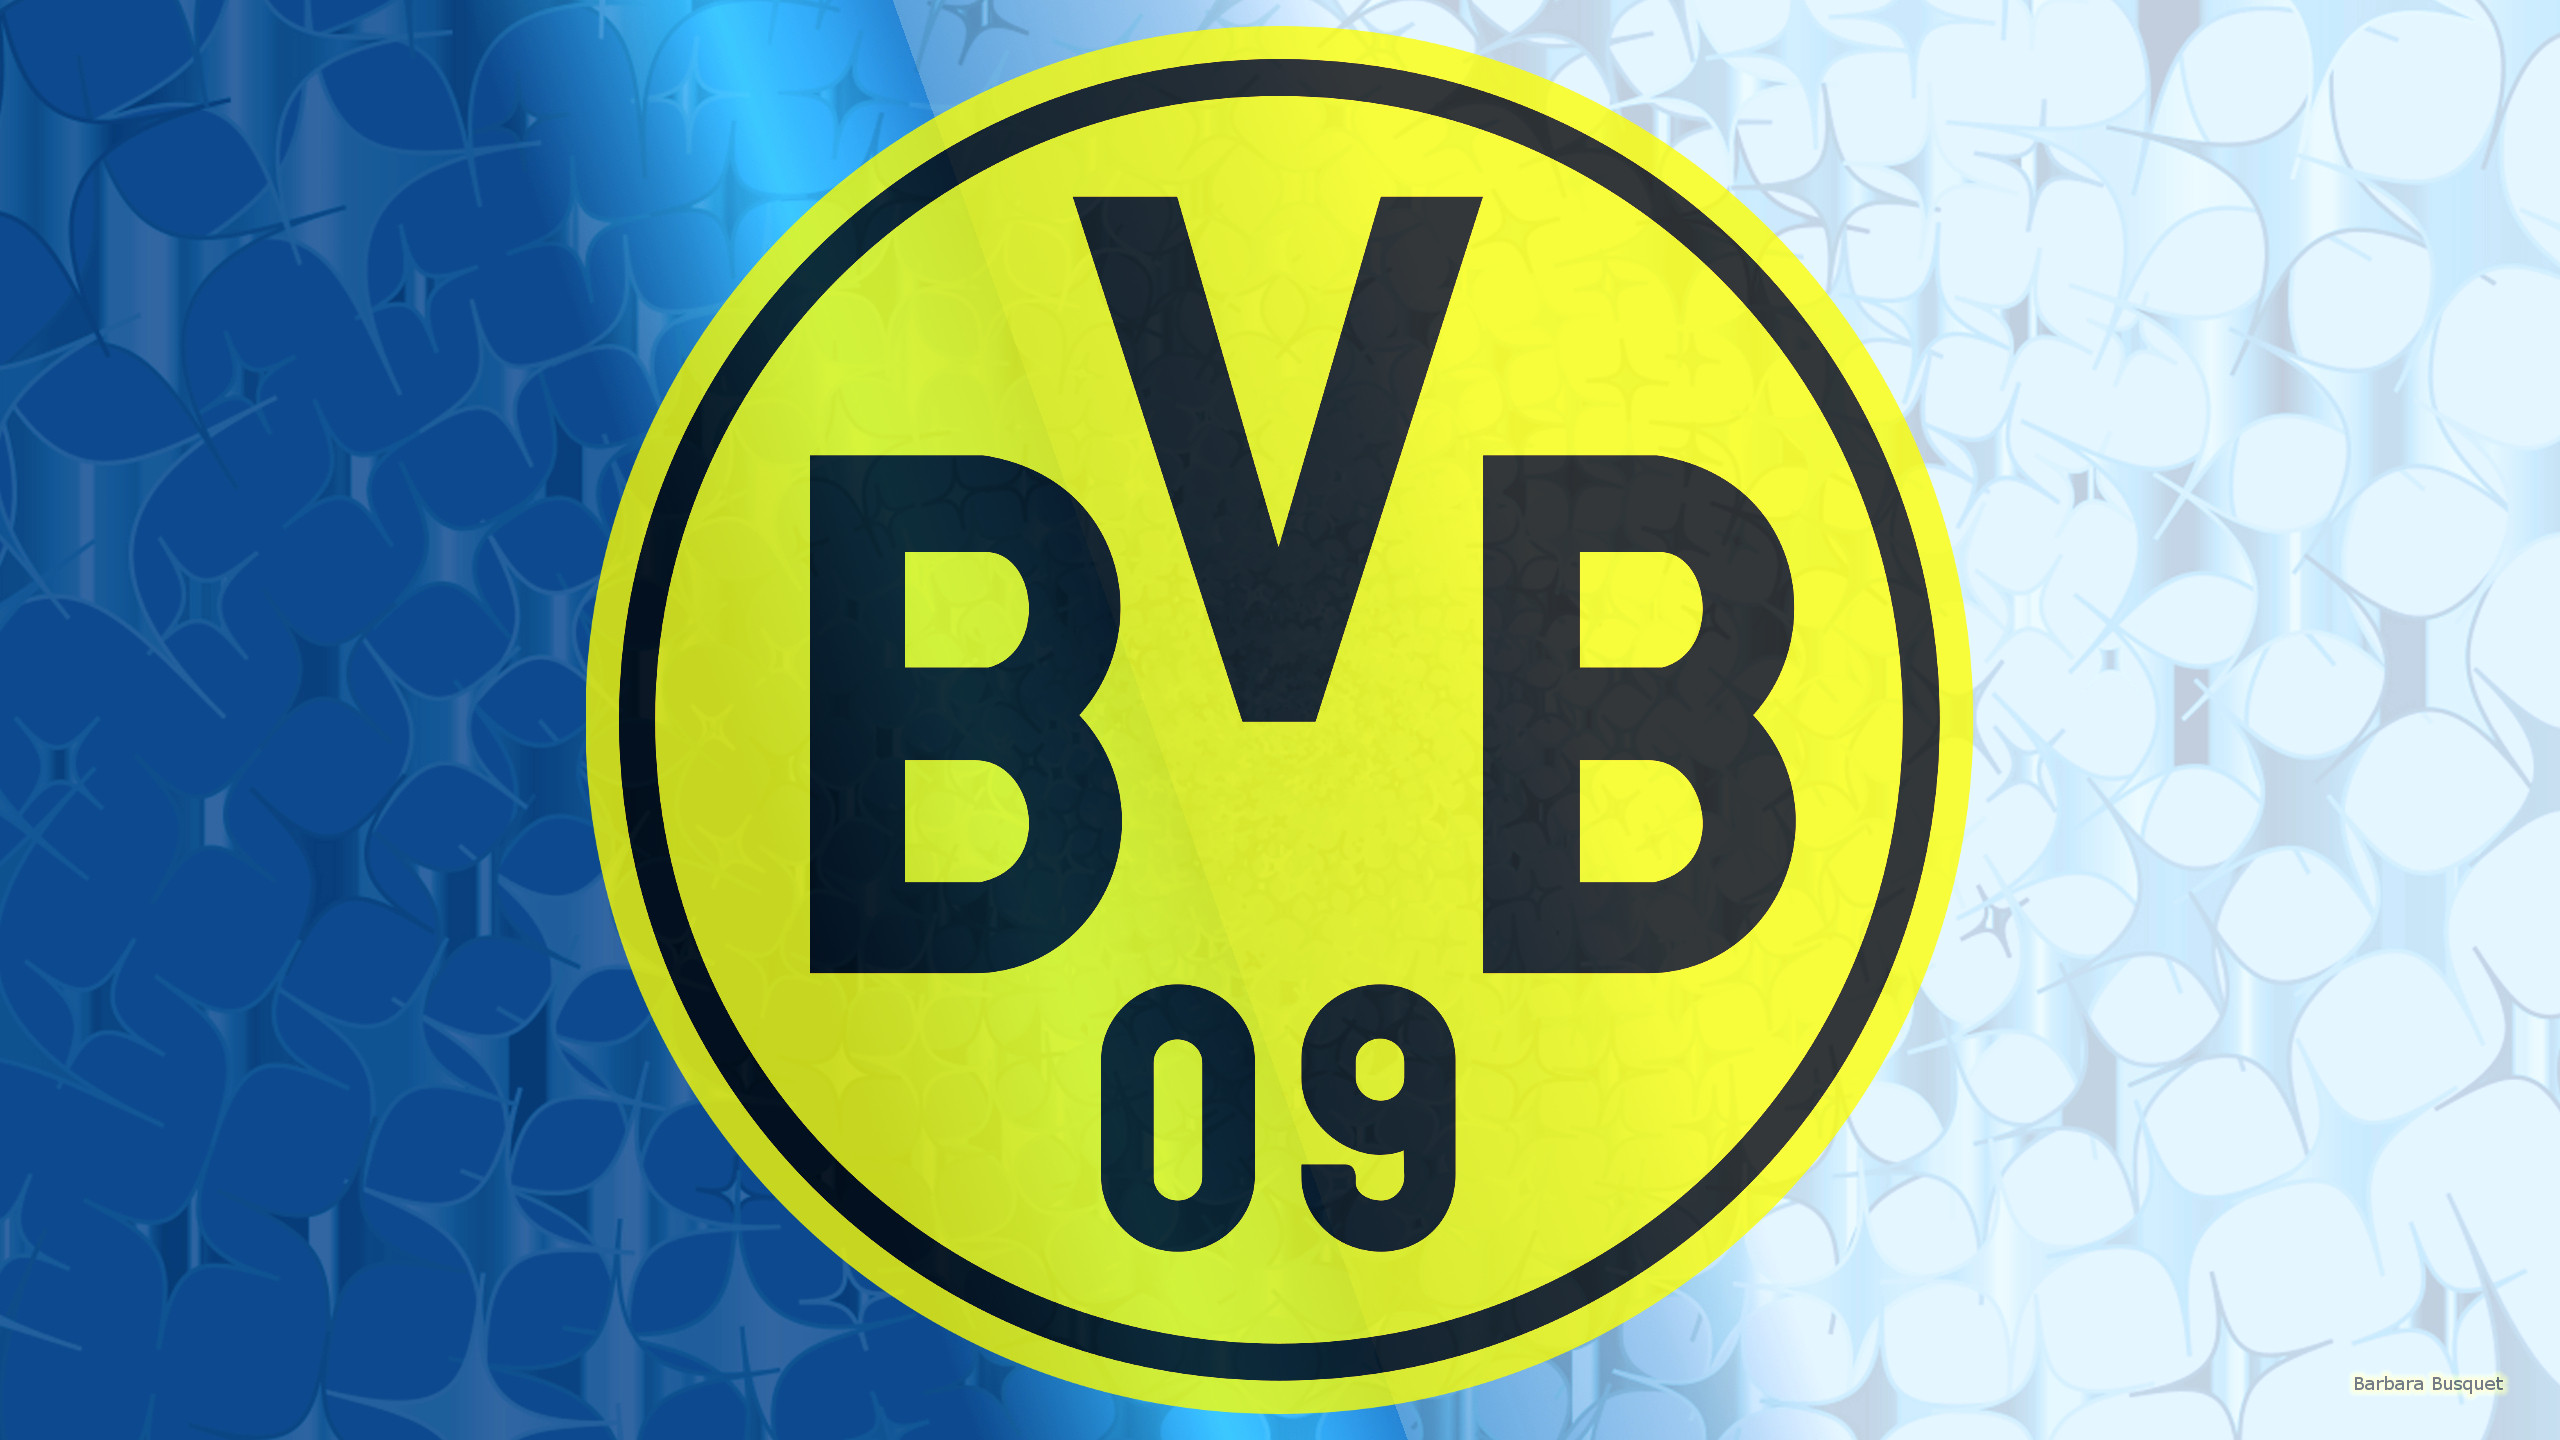 Borussia dortmund wallpapers barbaras hd wallpapers blue borussia dortmund football wallpaper with big logo voltagebd Choice Image